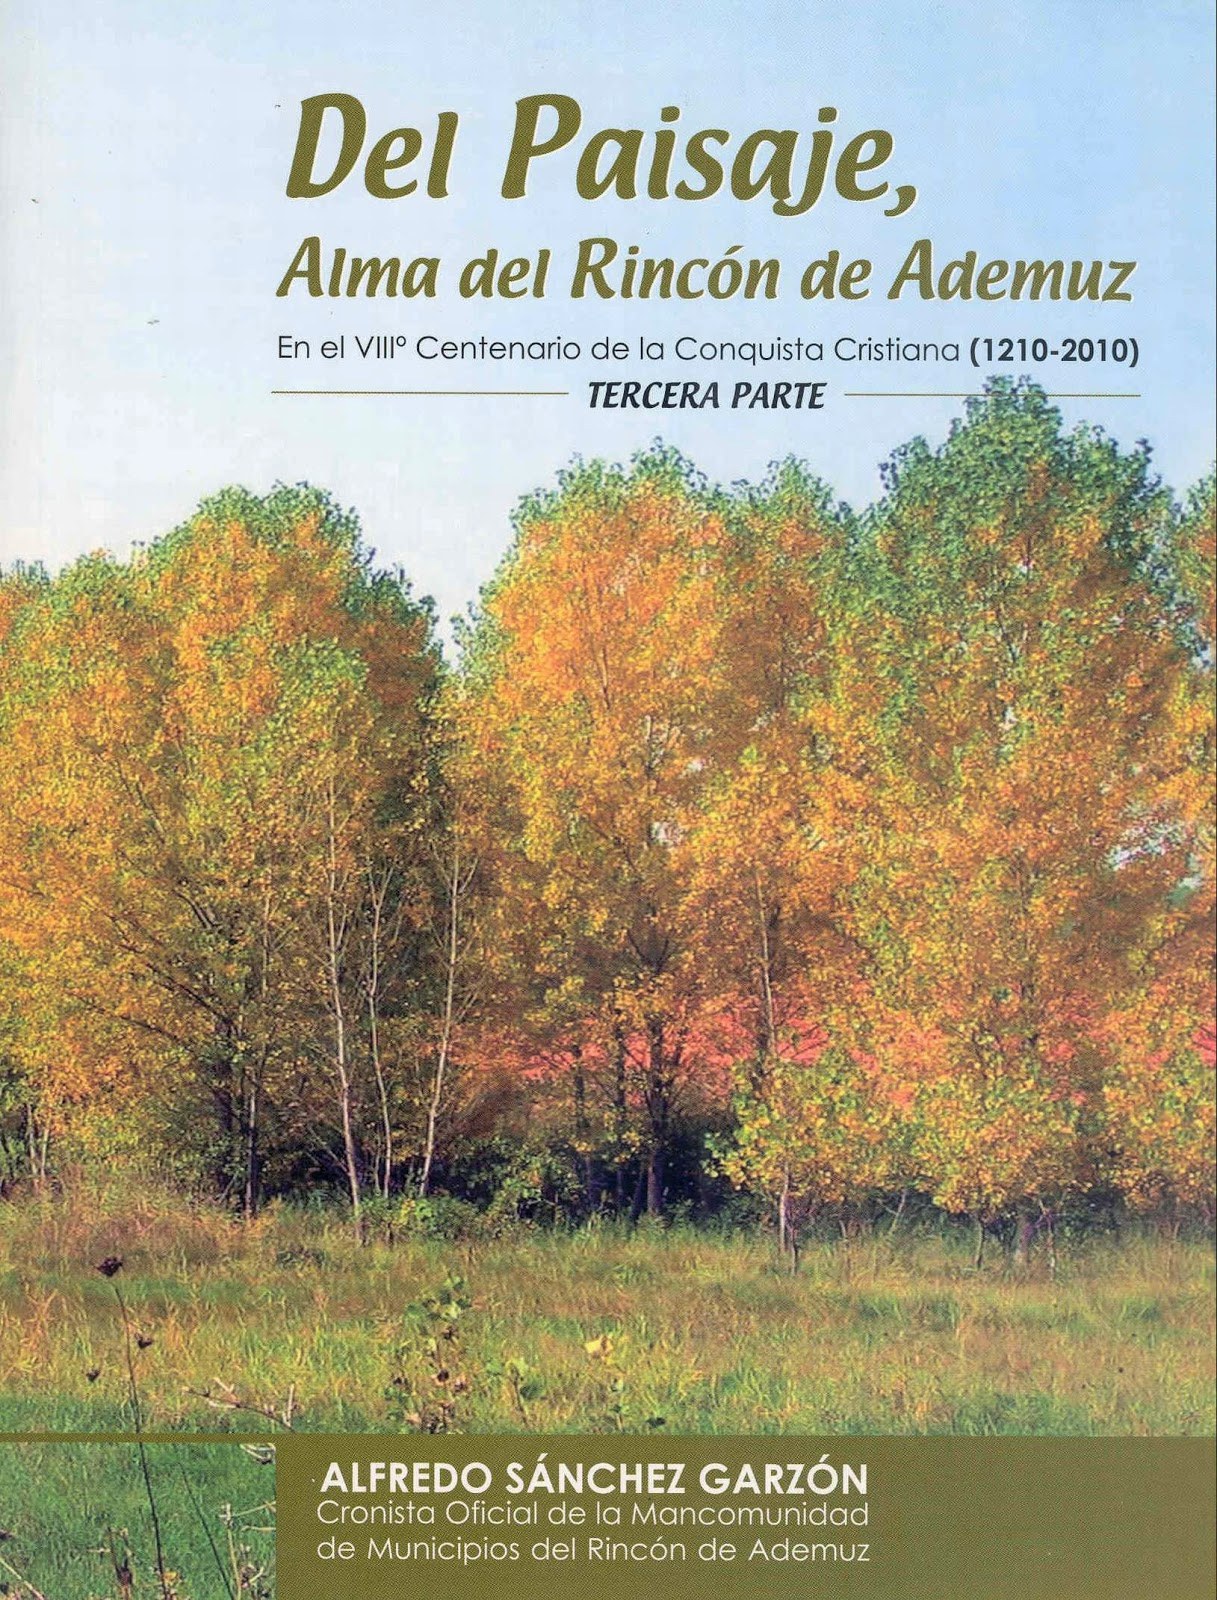 paisaje-rincon-ademuz-alfredo-sanchez-garzon-2009